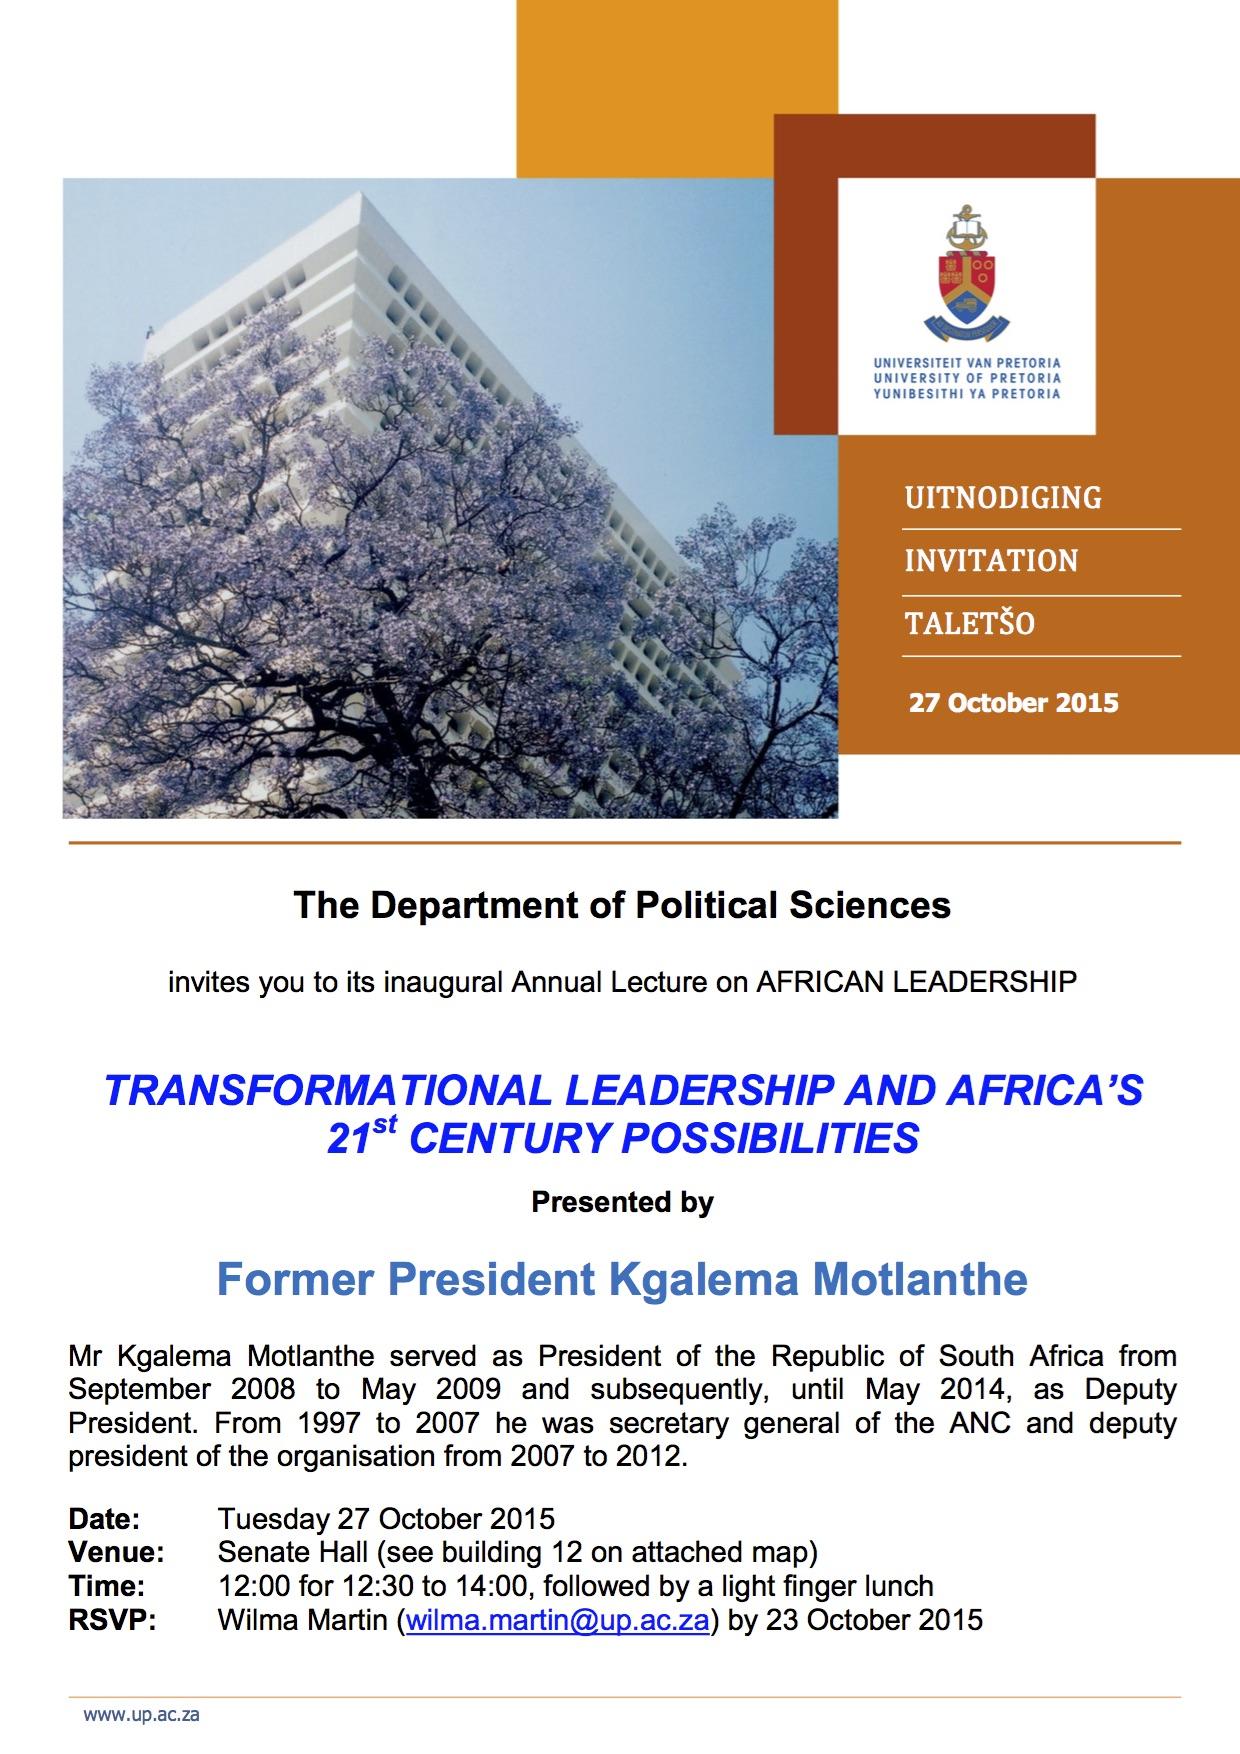 Kgalema Motlanthe Presentation